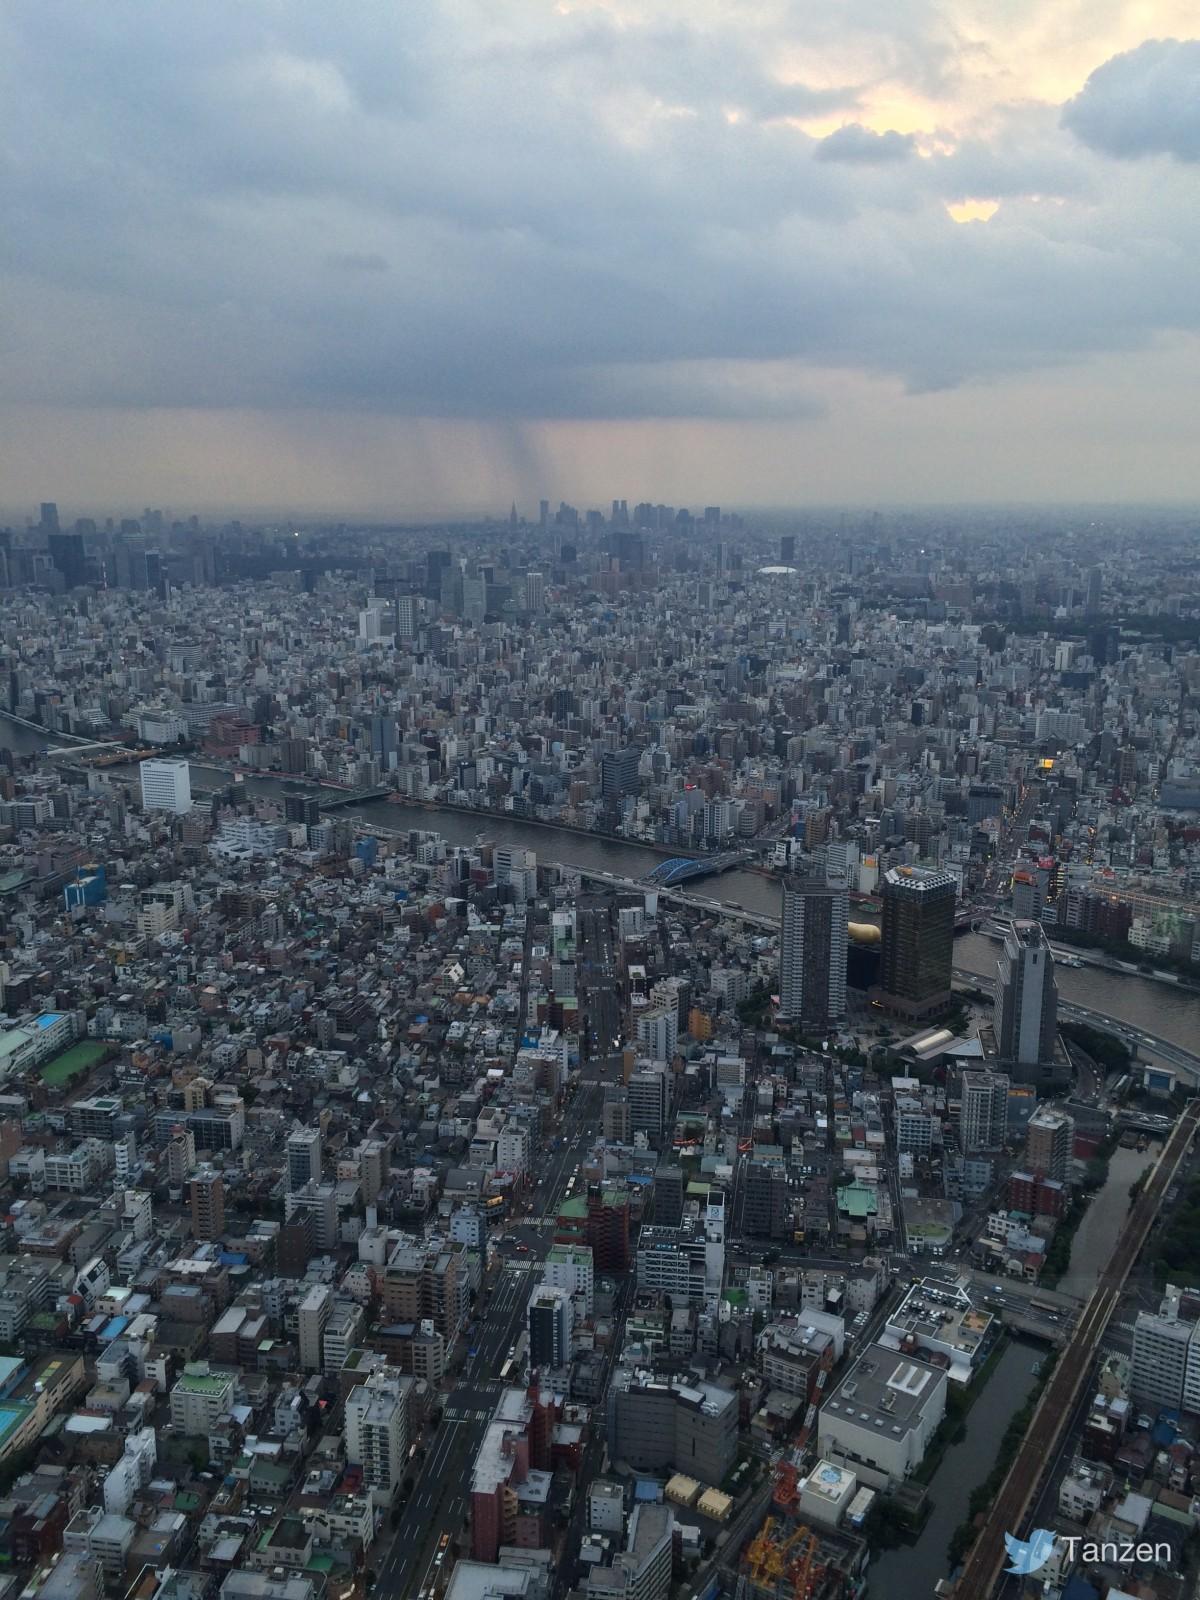 2014-09-12 17.29.43 HDR_watermark